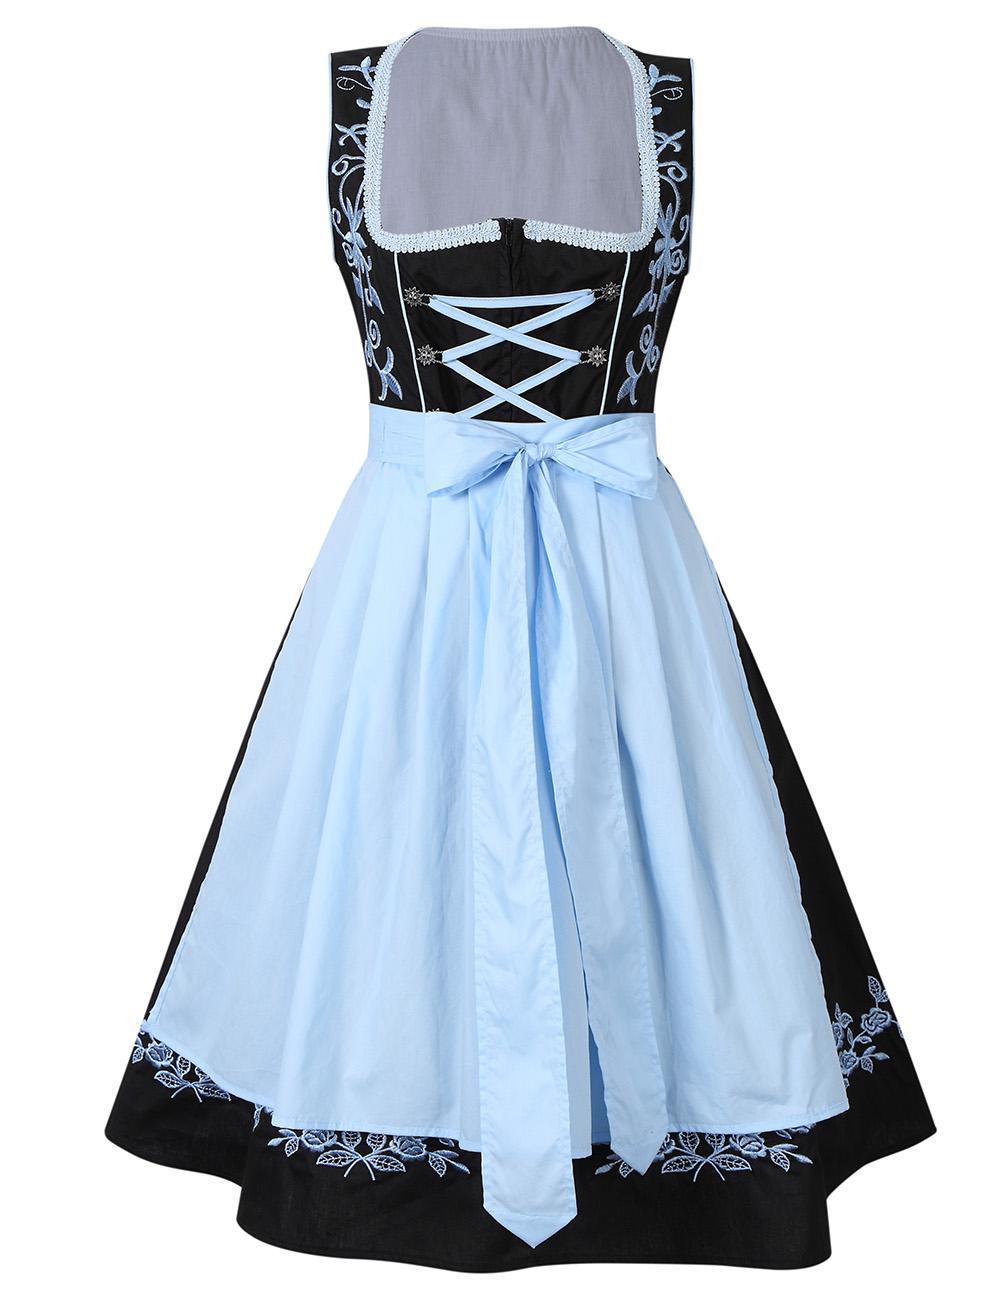 Kojooin Women 2 Pcs Costumes Embroidery Oktoberfest Dirndl Dress Black_Thirty-four